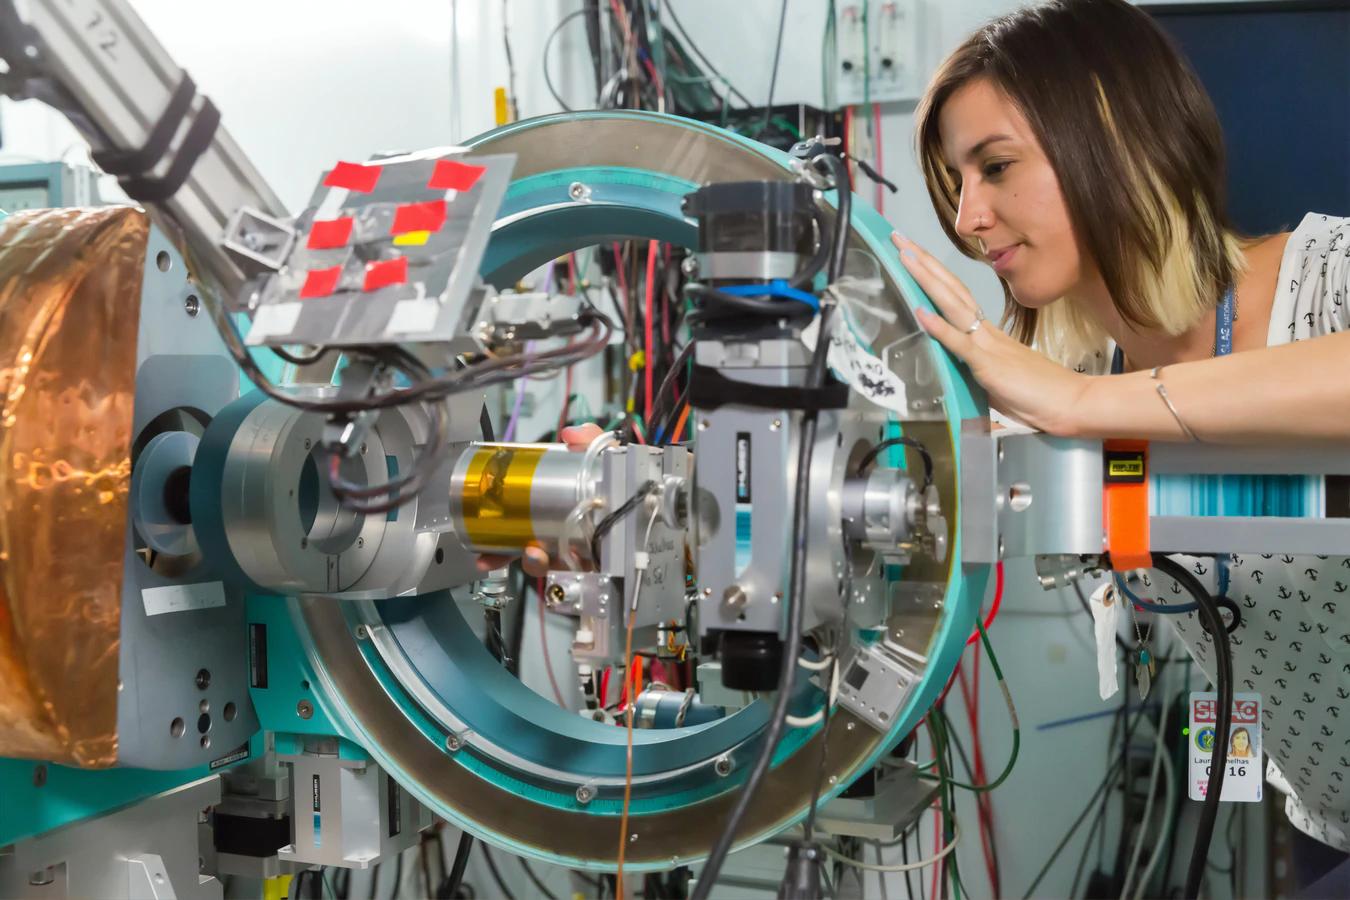 Scientist adjusting instrumentation of device